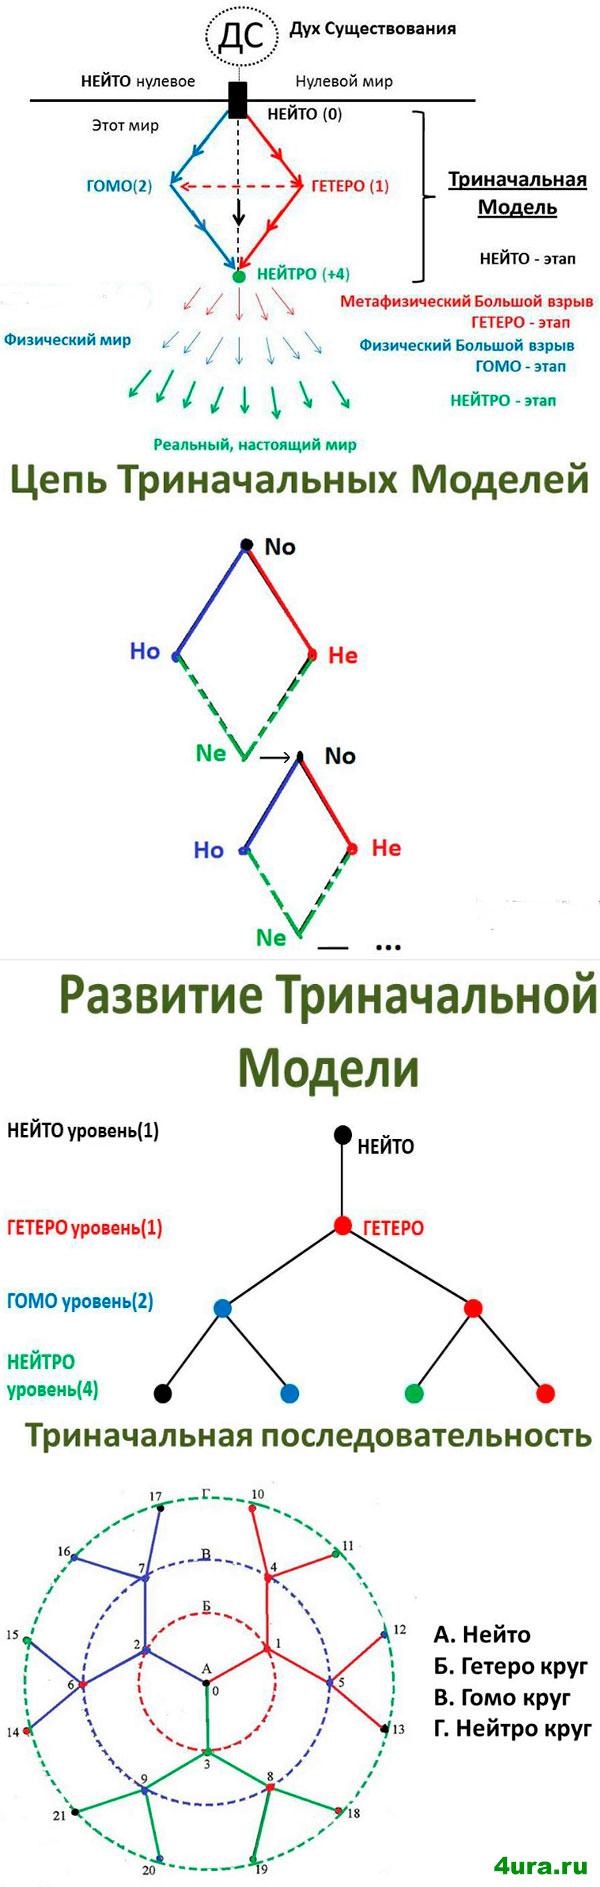 development of the tri-primary model